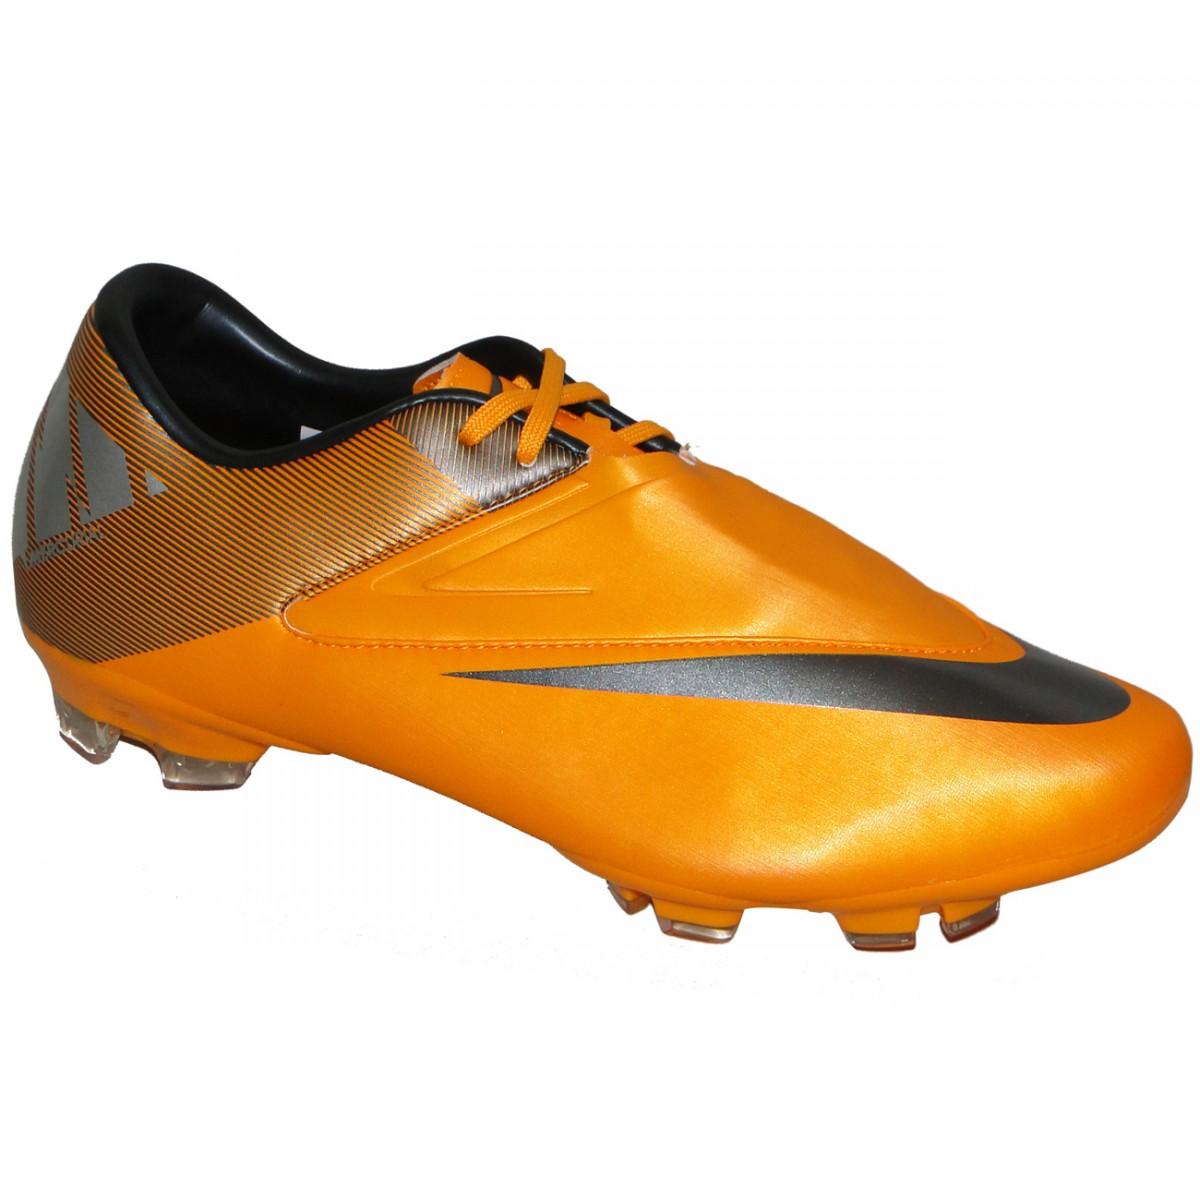 ec795358bb Chuteira Nike Mercurial Glide Ii 9231 - LARANJA PRETO - Chuteira Nike